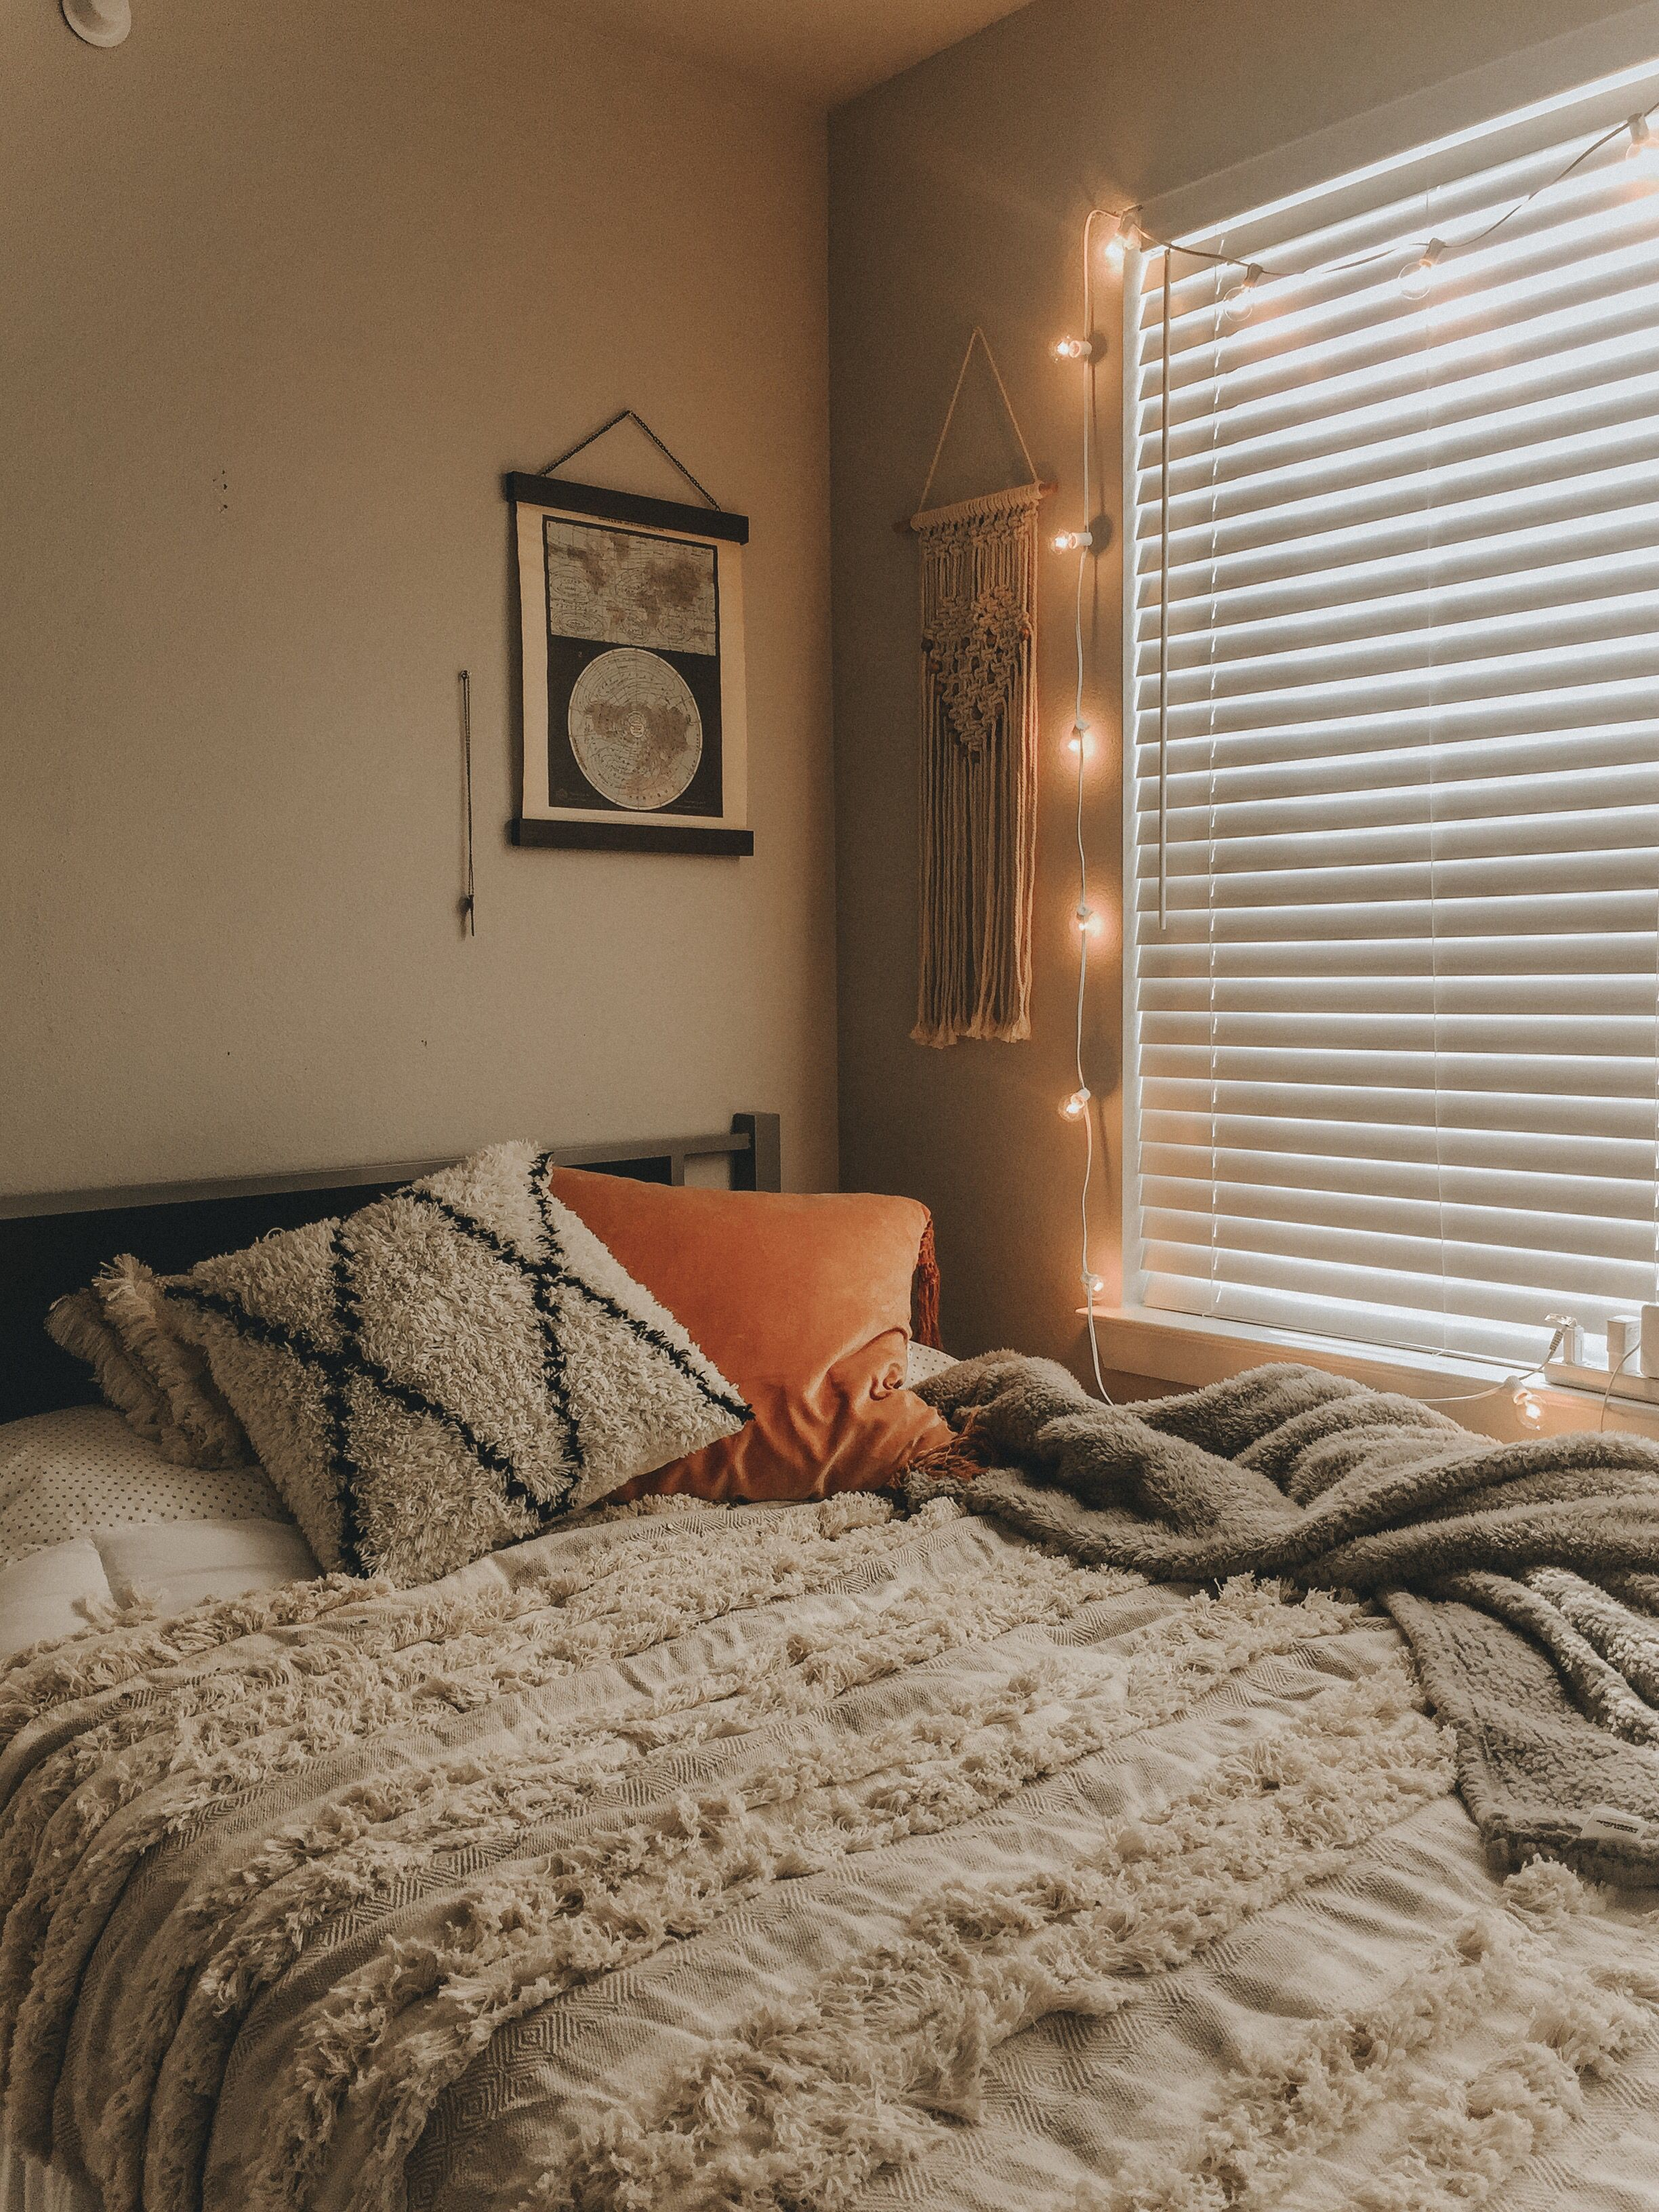 Bedroom Dormdecor Dorm Aesthetic Room Home Bedroom Design Bedroom Decor Cozy Bedroom Inspirations